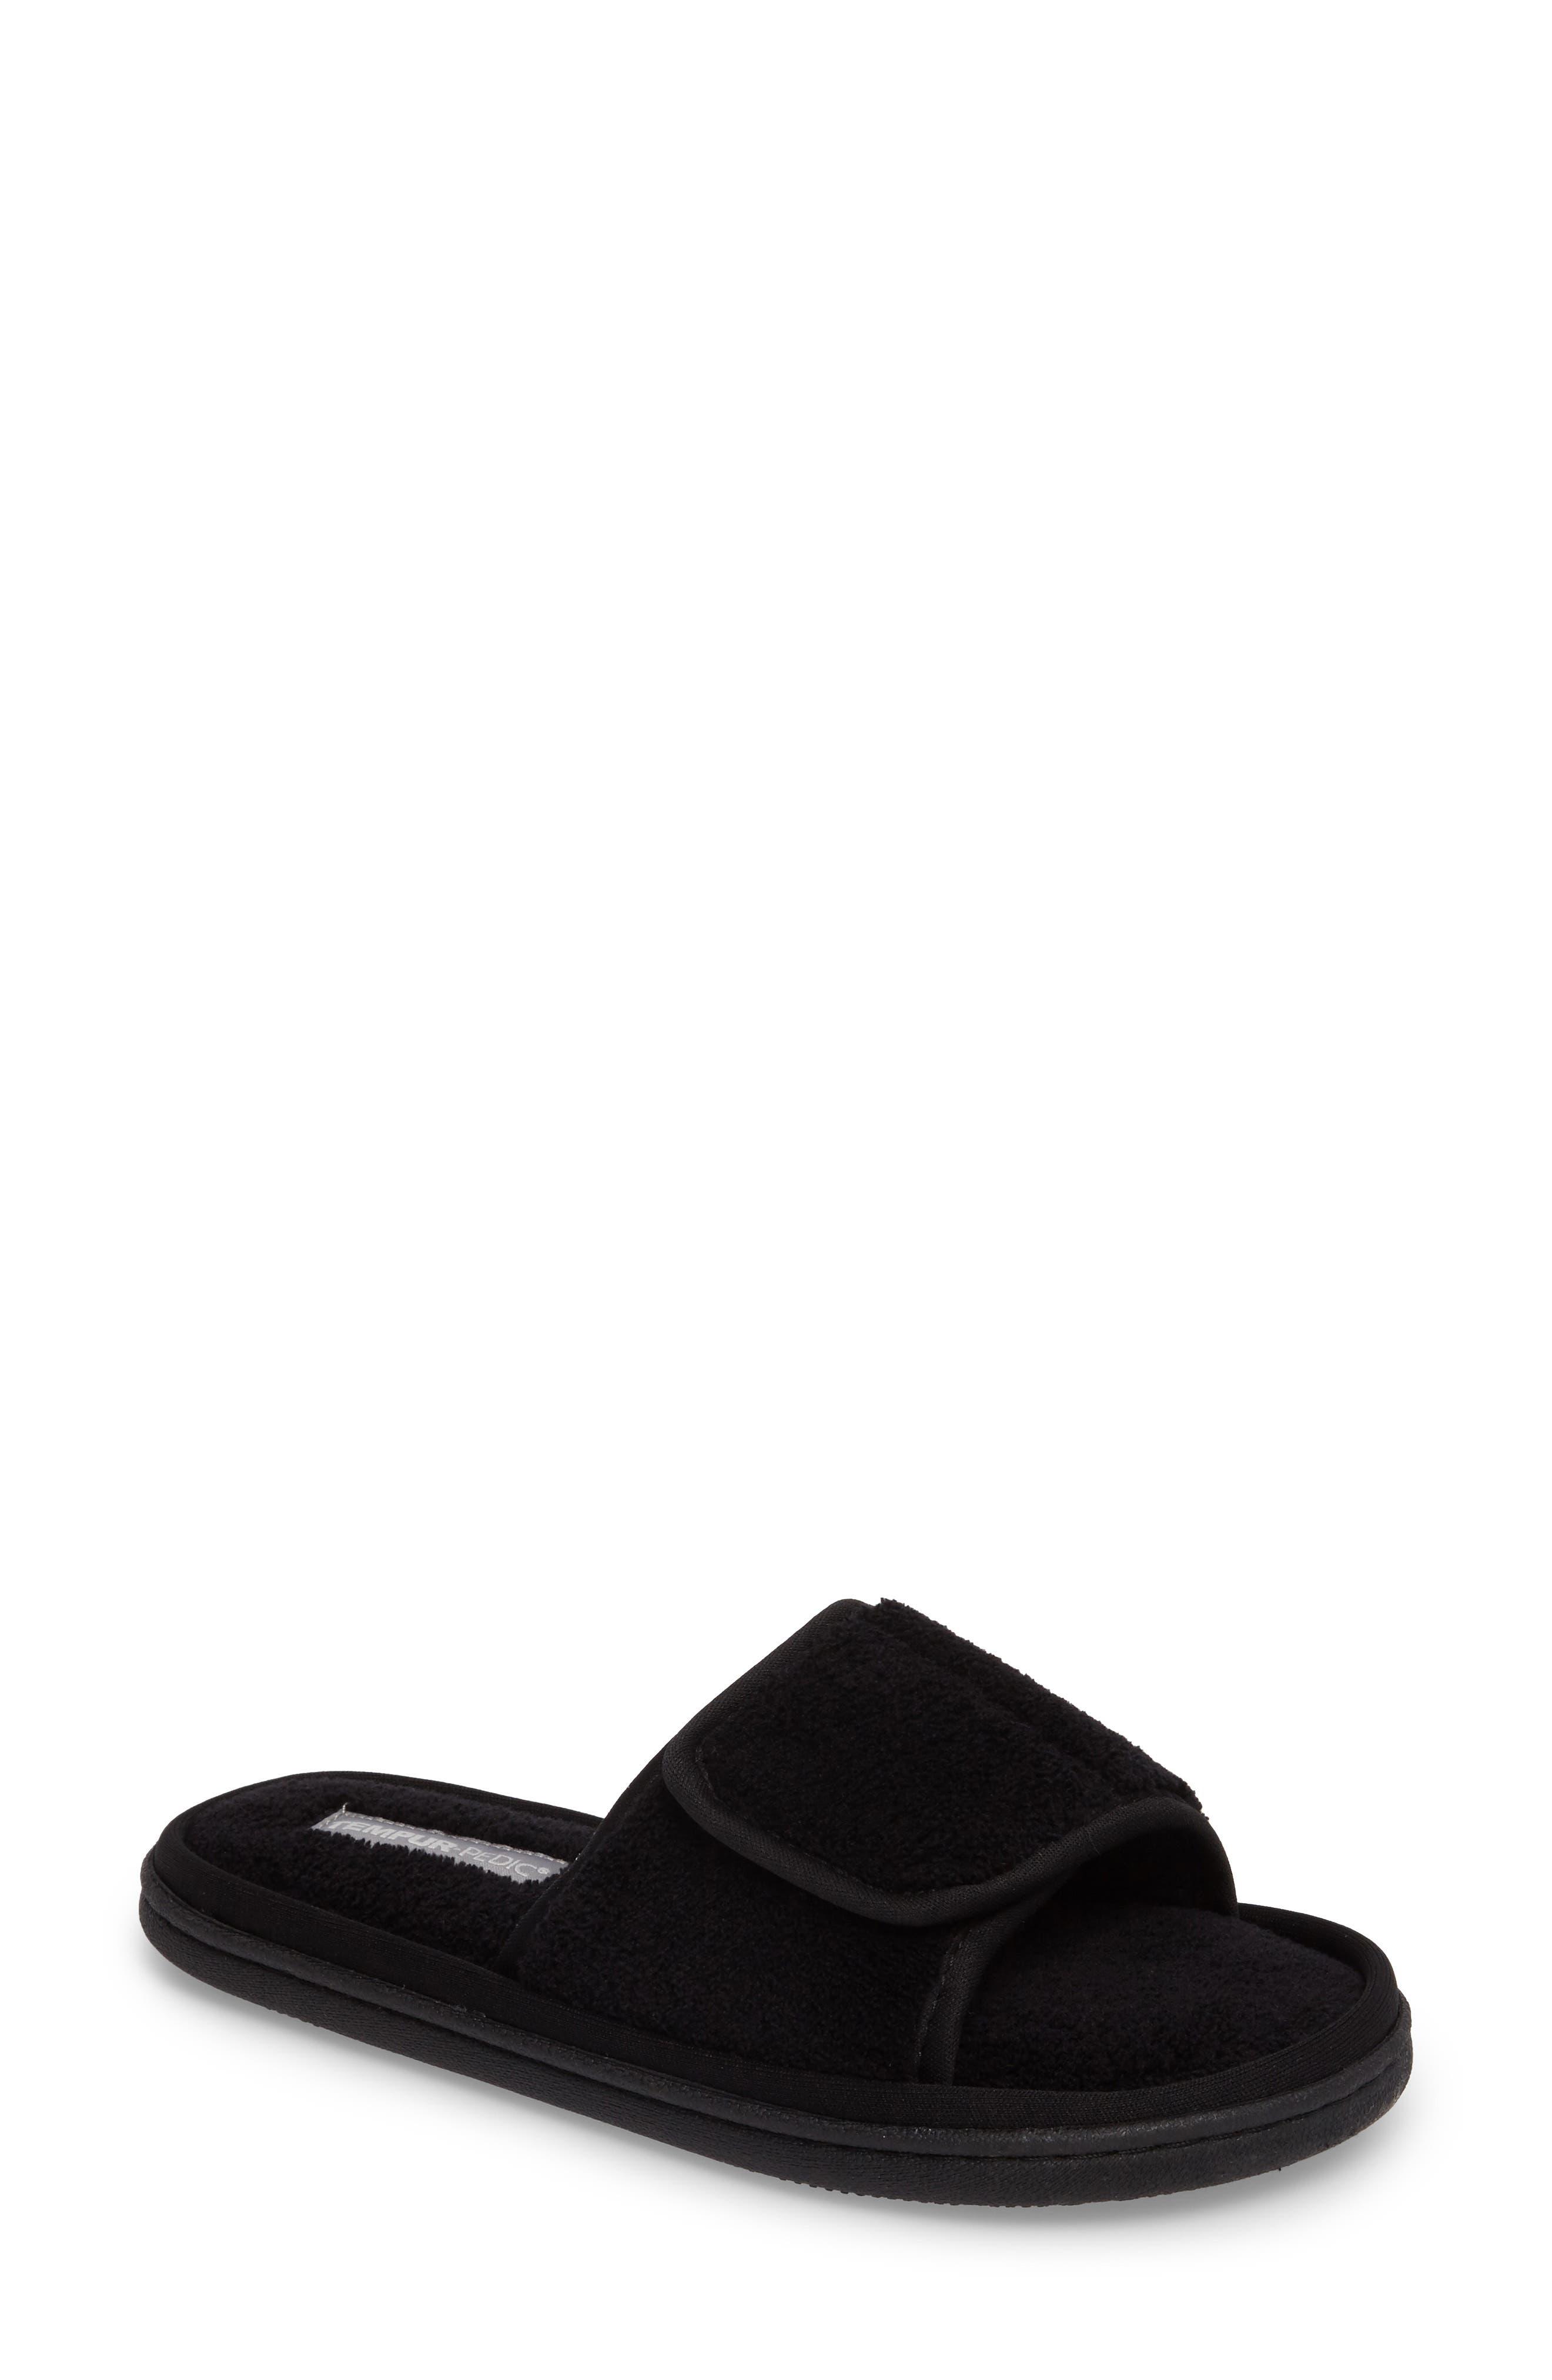 Geana Slipper,                             Main thumbnail 1, color,                             Black Fabric